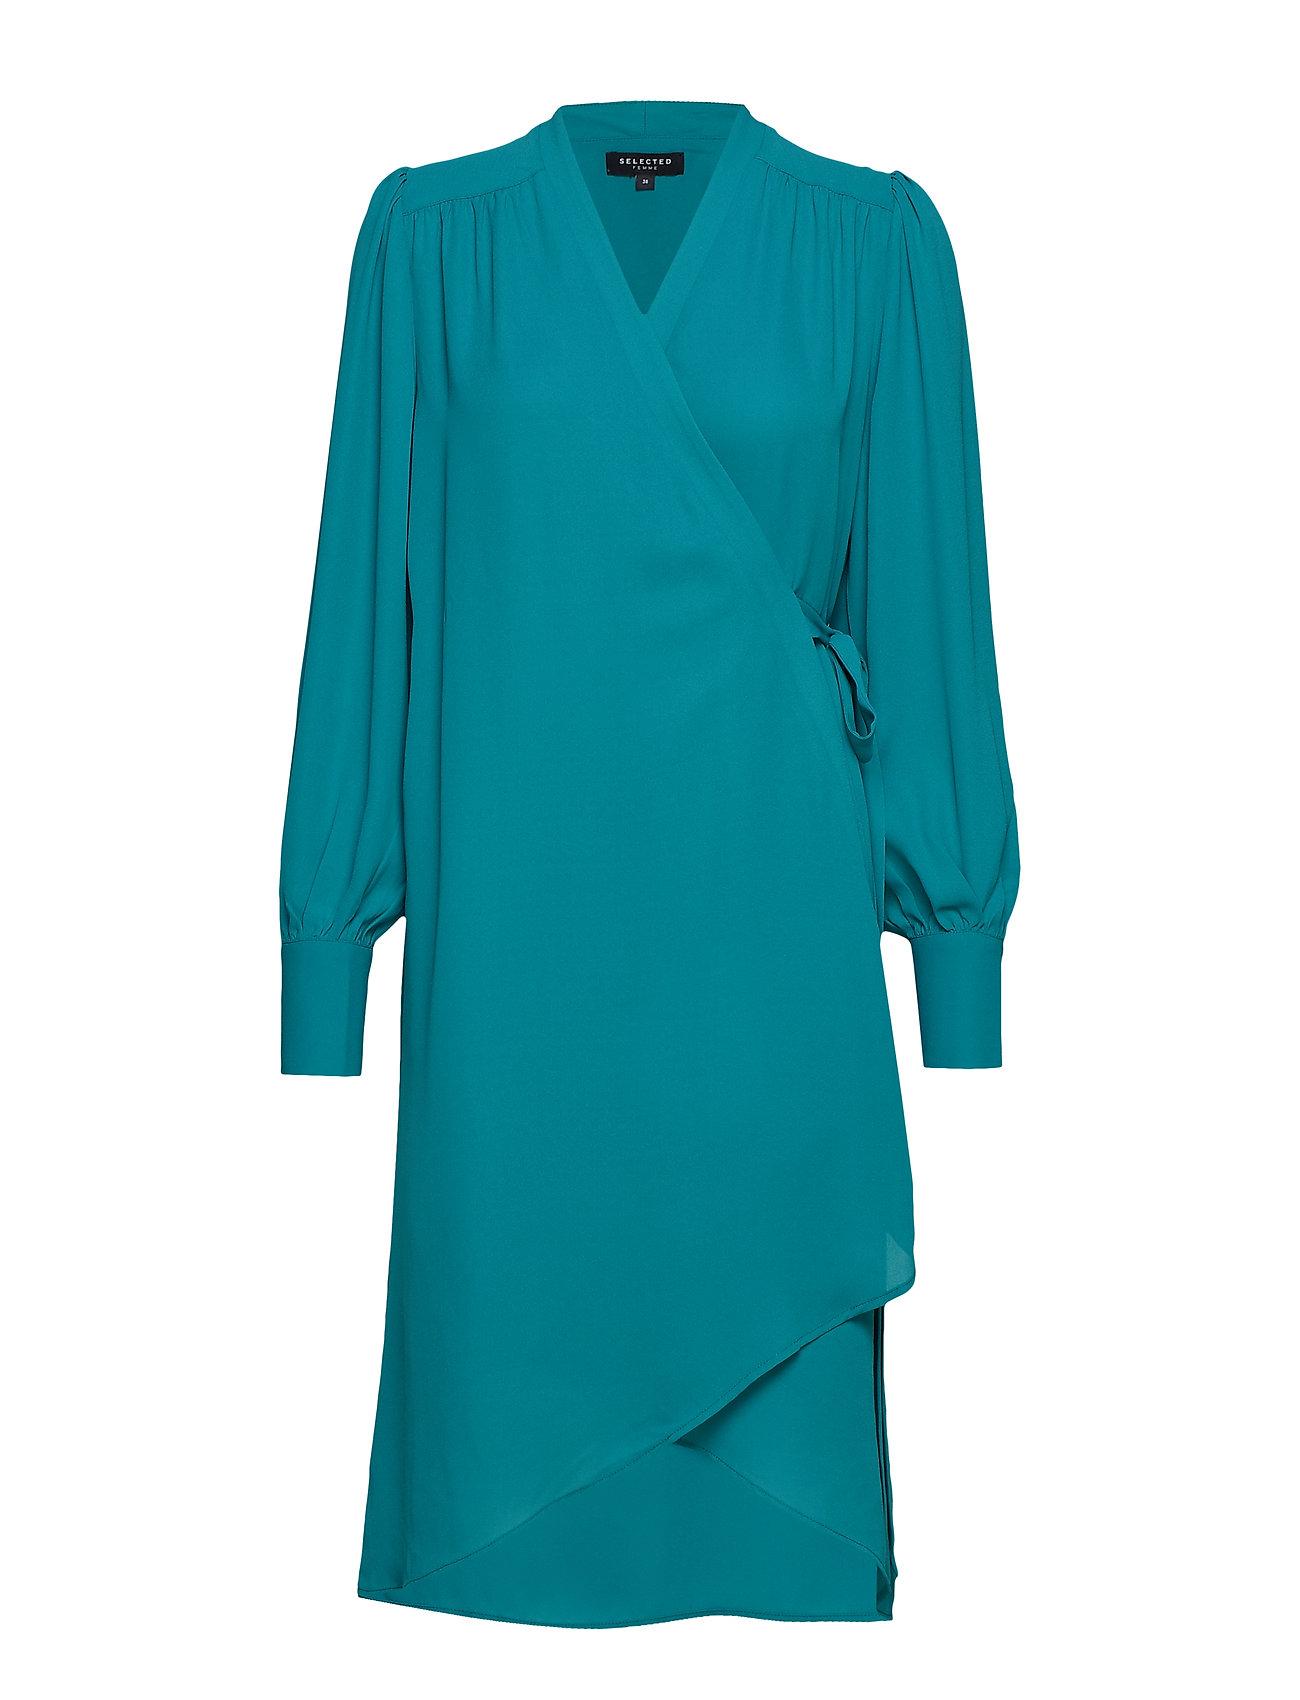 Selected Femme SLFALVA LS WRAP DRESS EX - TEAL GREEN